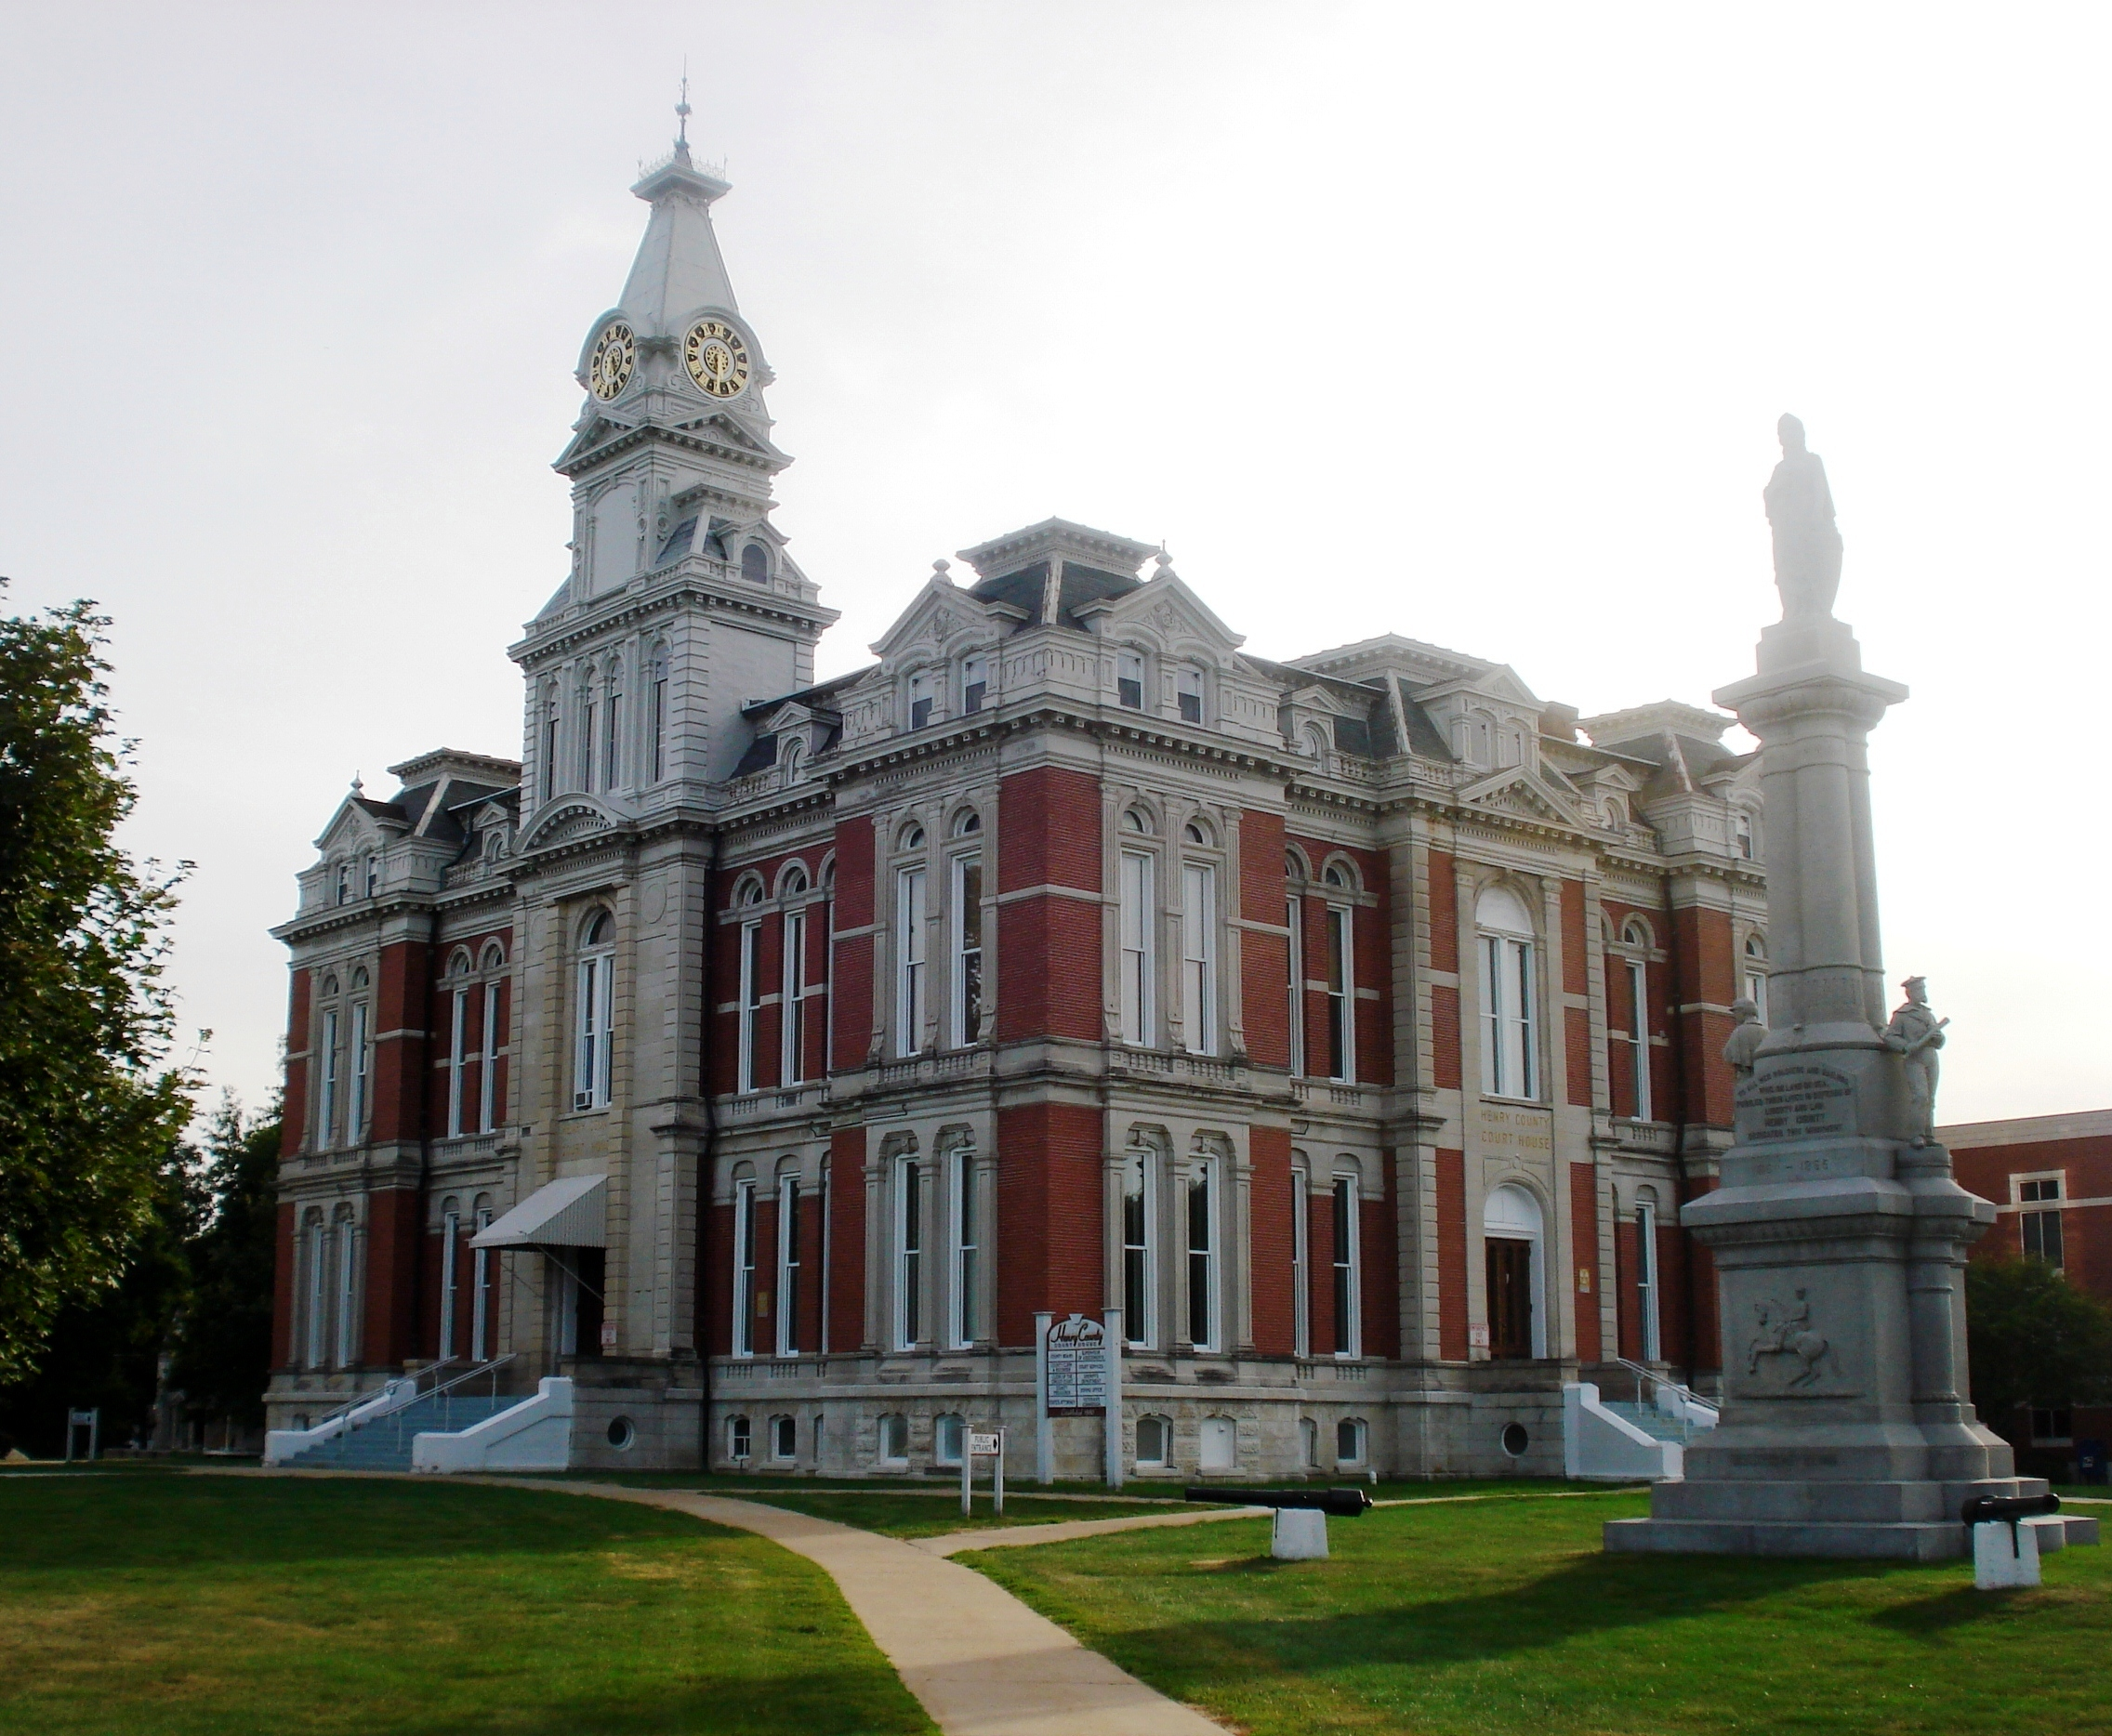 Illinois henry county andover - Illinois Henry County Andover 5